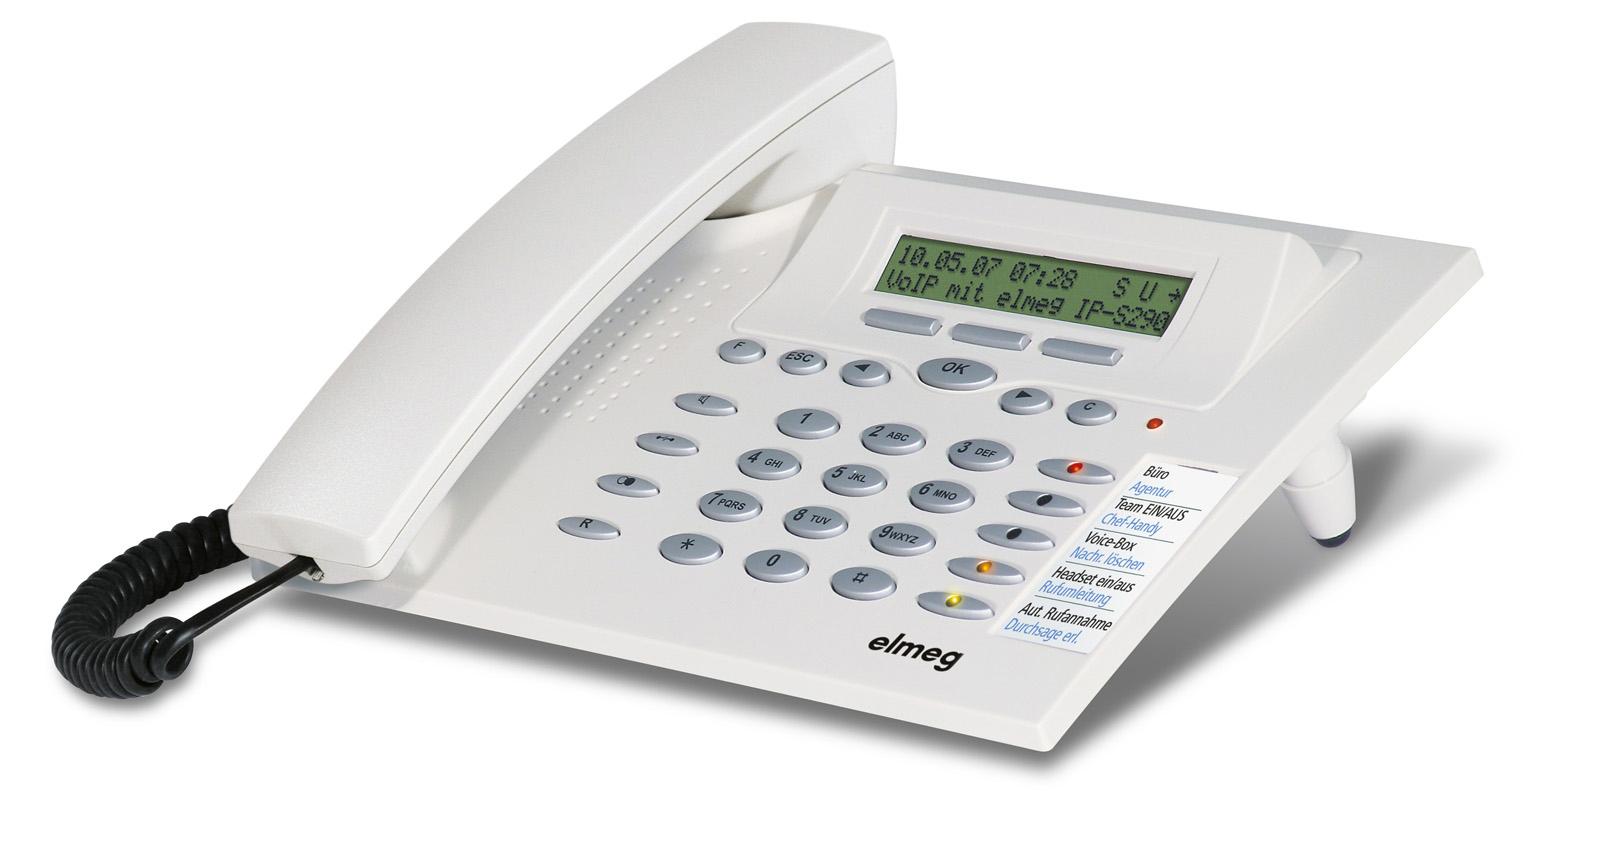 bintec-elmeg IP-S290